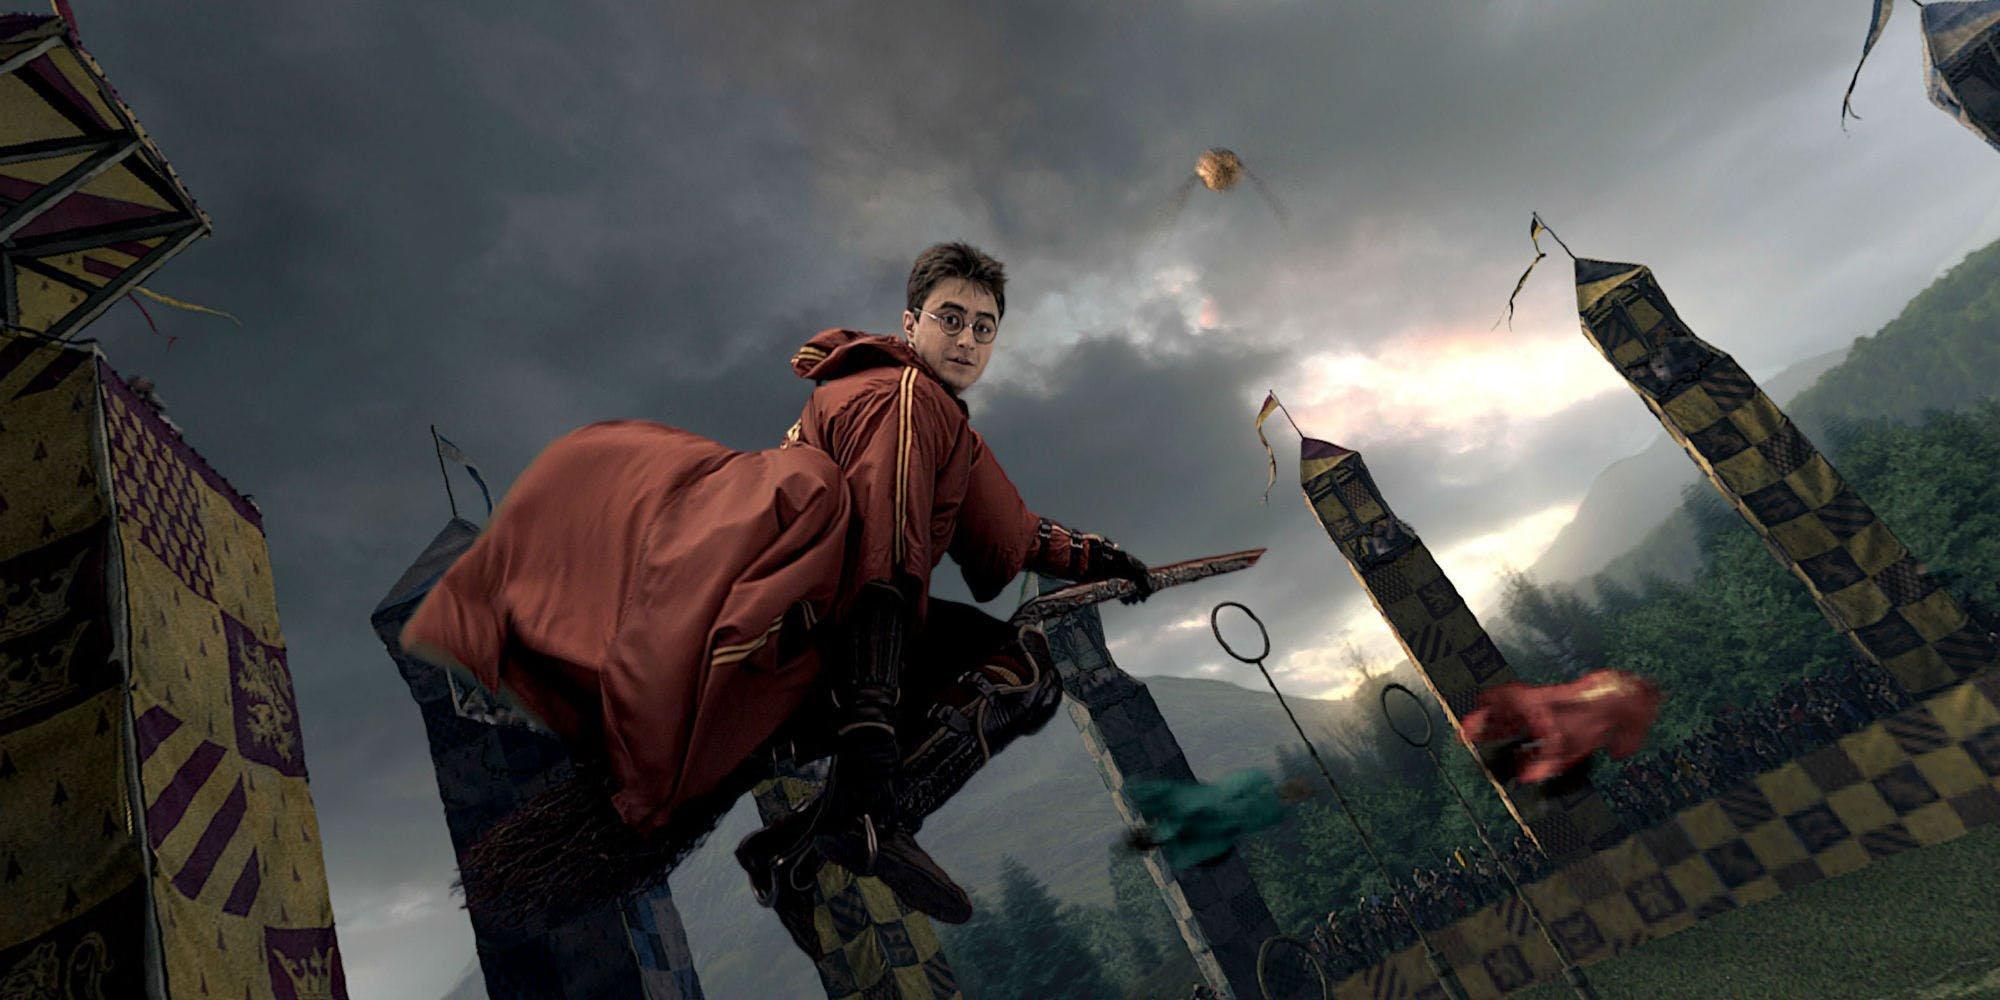 JK Rowling schools a critics in Quidditch Warner Bros.